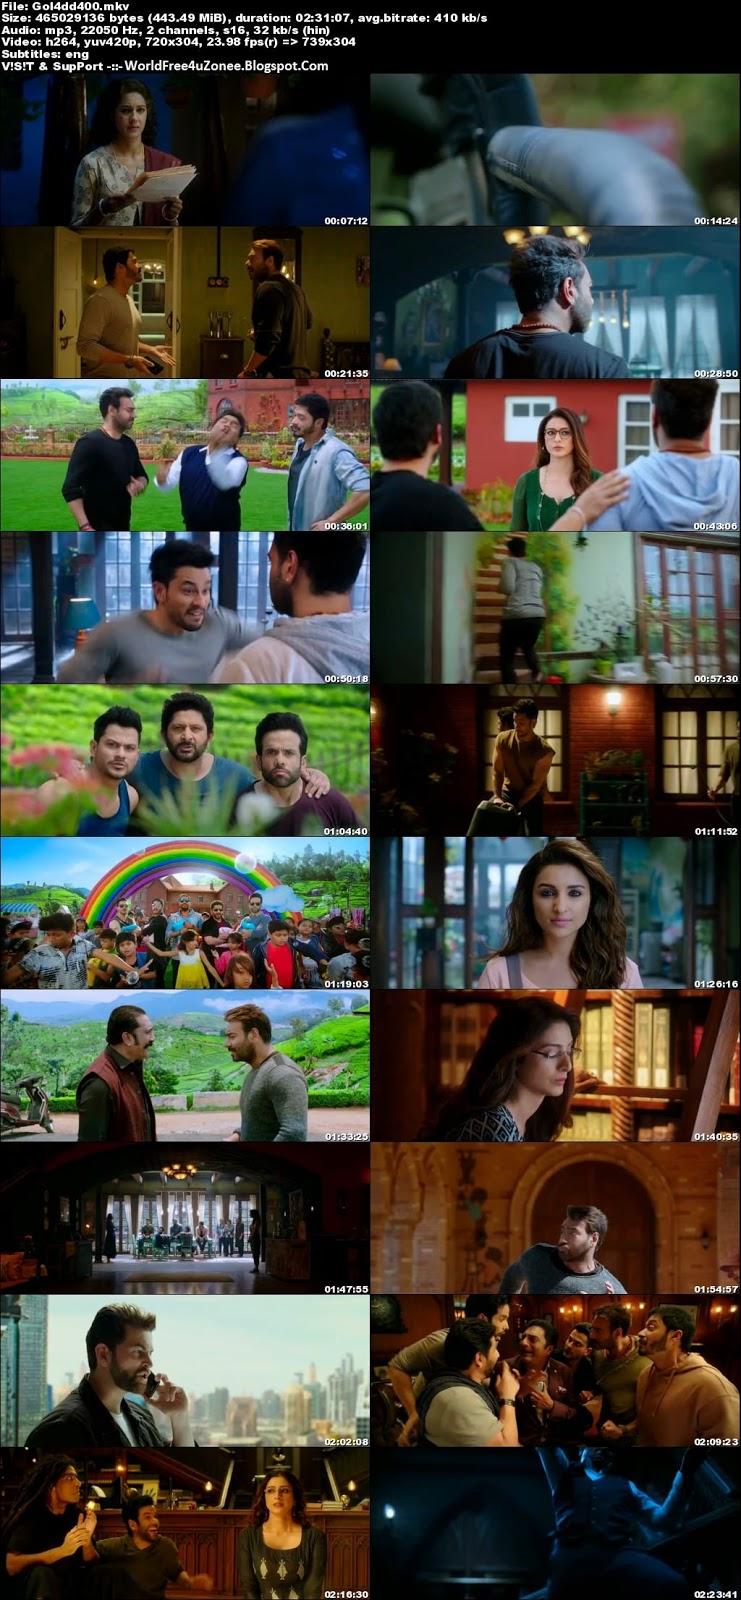 Golmaal Again (2017) Hindi DVDRip 480p 400MB Full Movie Free Download And Watch Online Latest Bollywood Hindi Movies 2017 Free At WorldFree4uZonee.Blogspot.Com